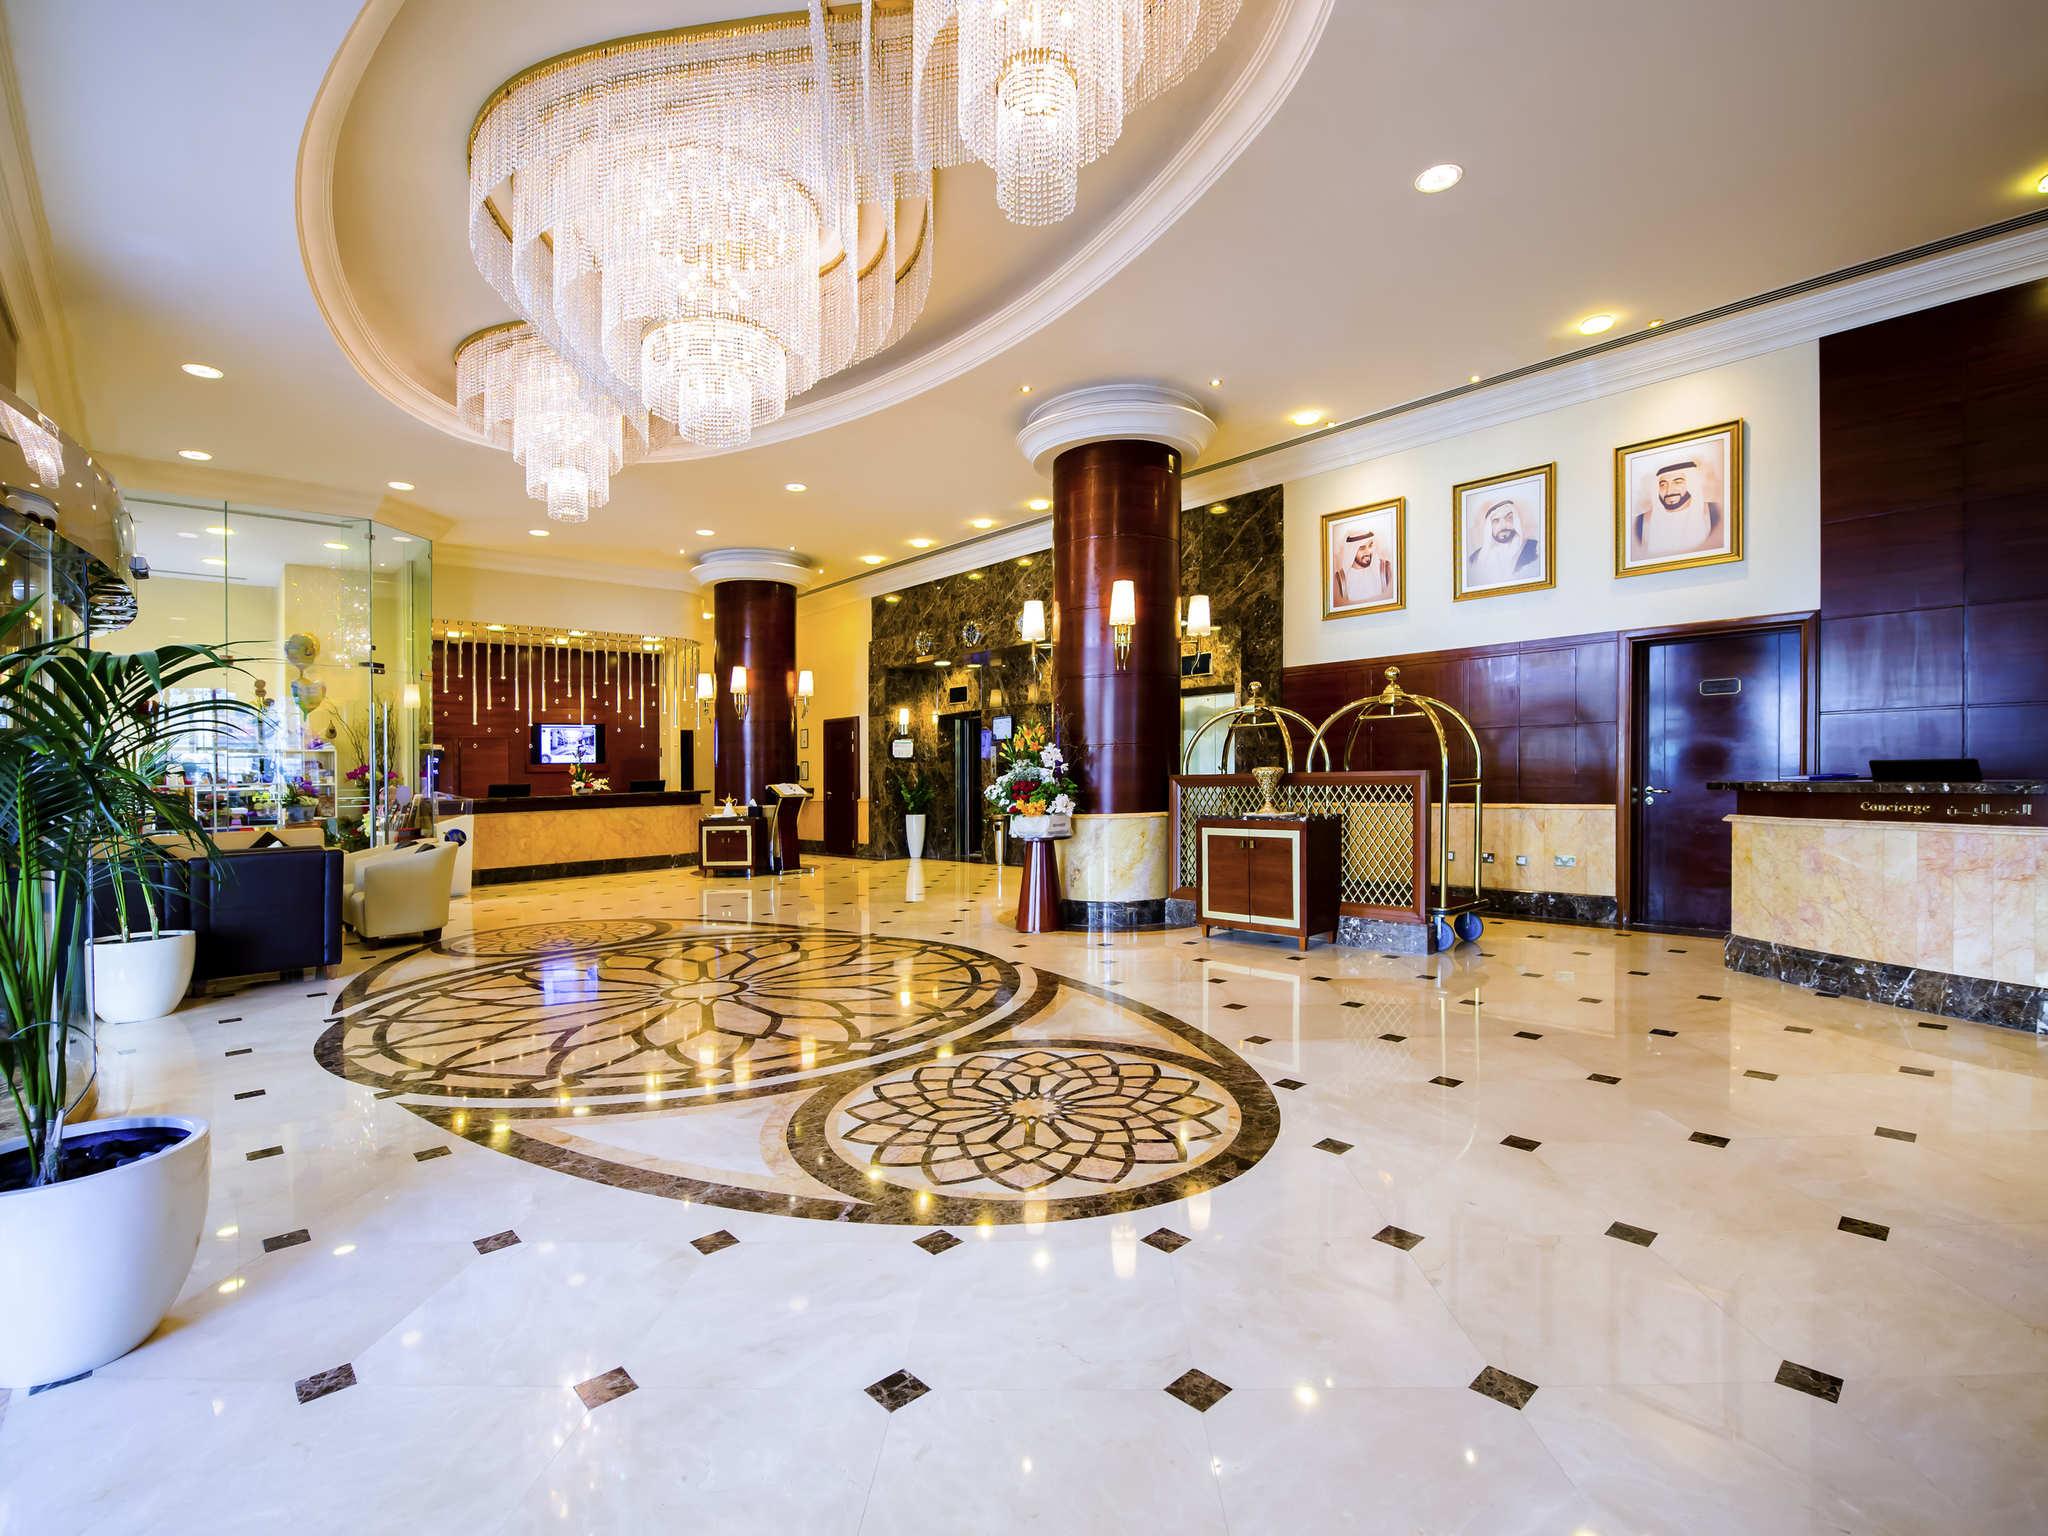 فندق - مساكن المجلس جراند مركيور Grand Mercure أبو ظبي